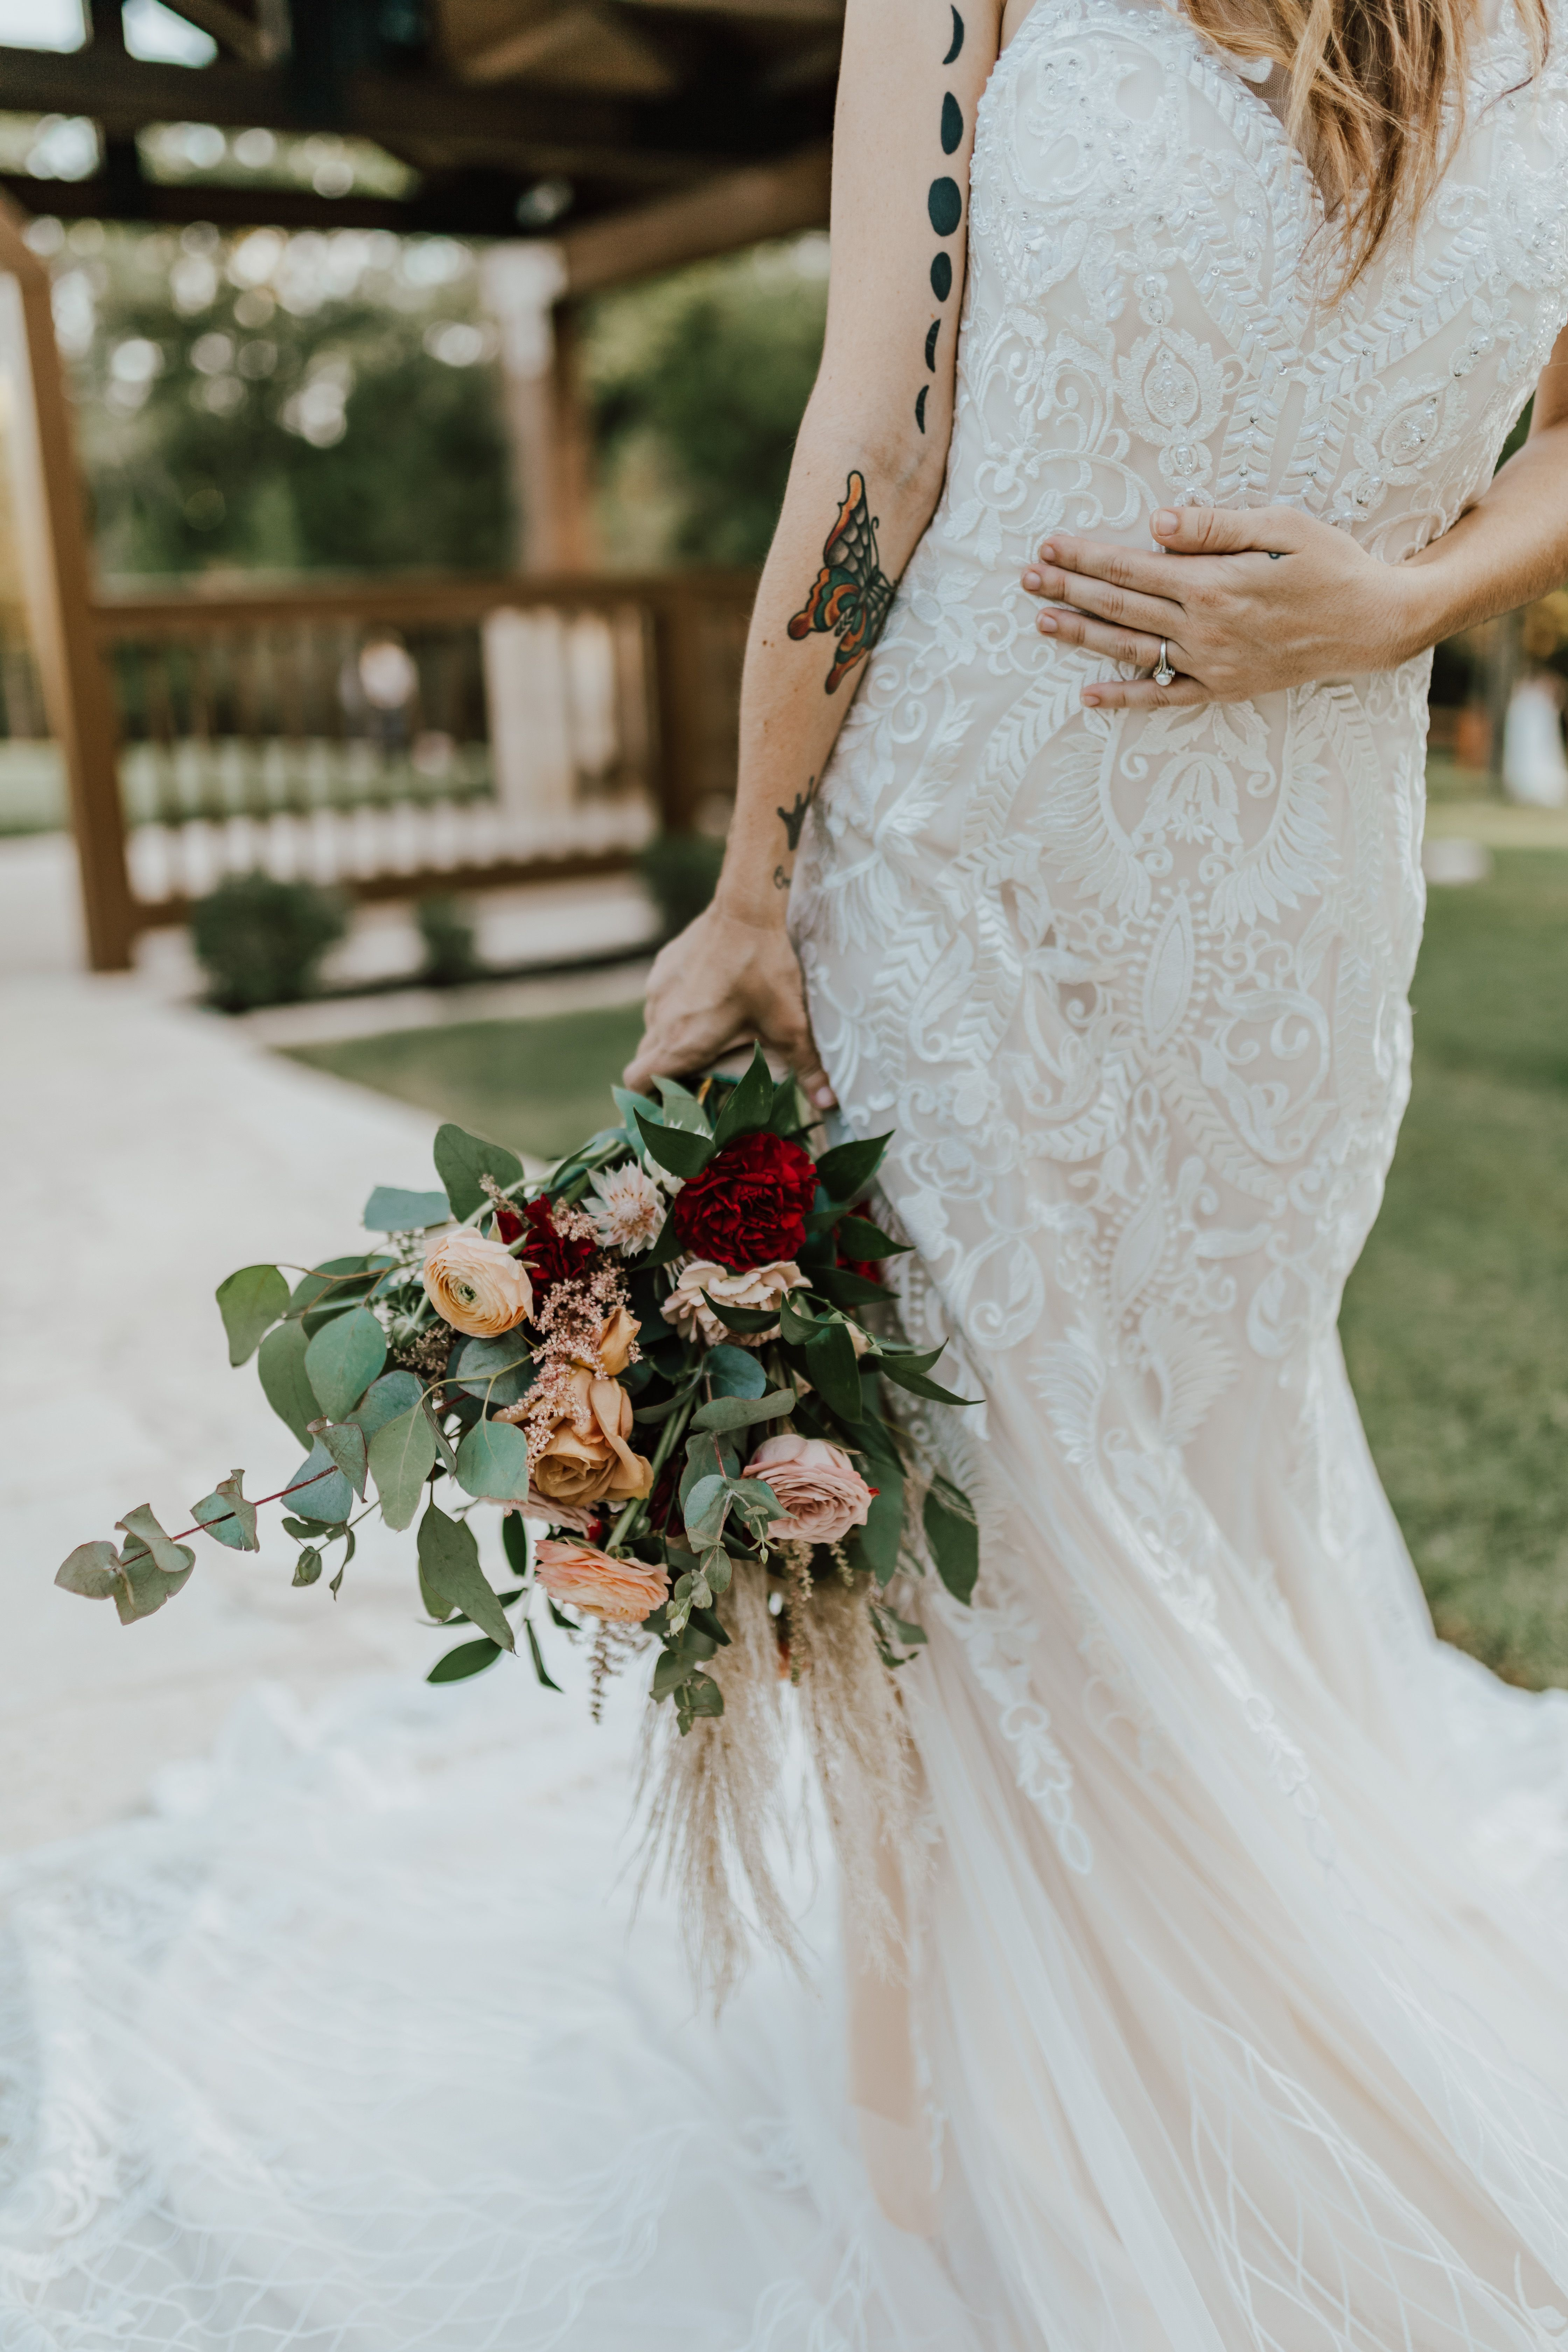 The Springs In Mckinney Wedding Dress Trends Bohemian Wedding Dress Form Fitting Wedding Dress,Beach Wedding Dress Ideas Plus Size